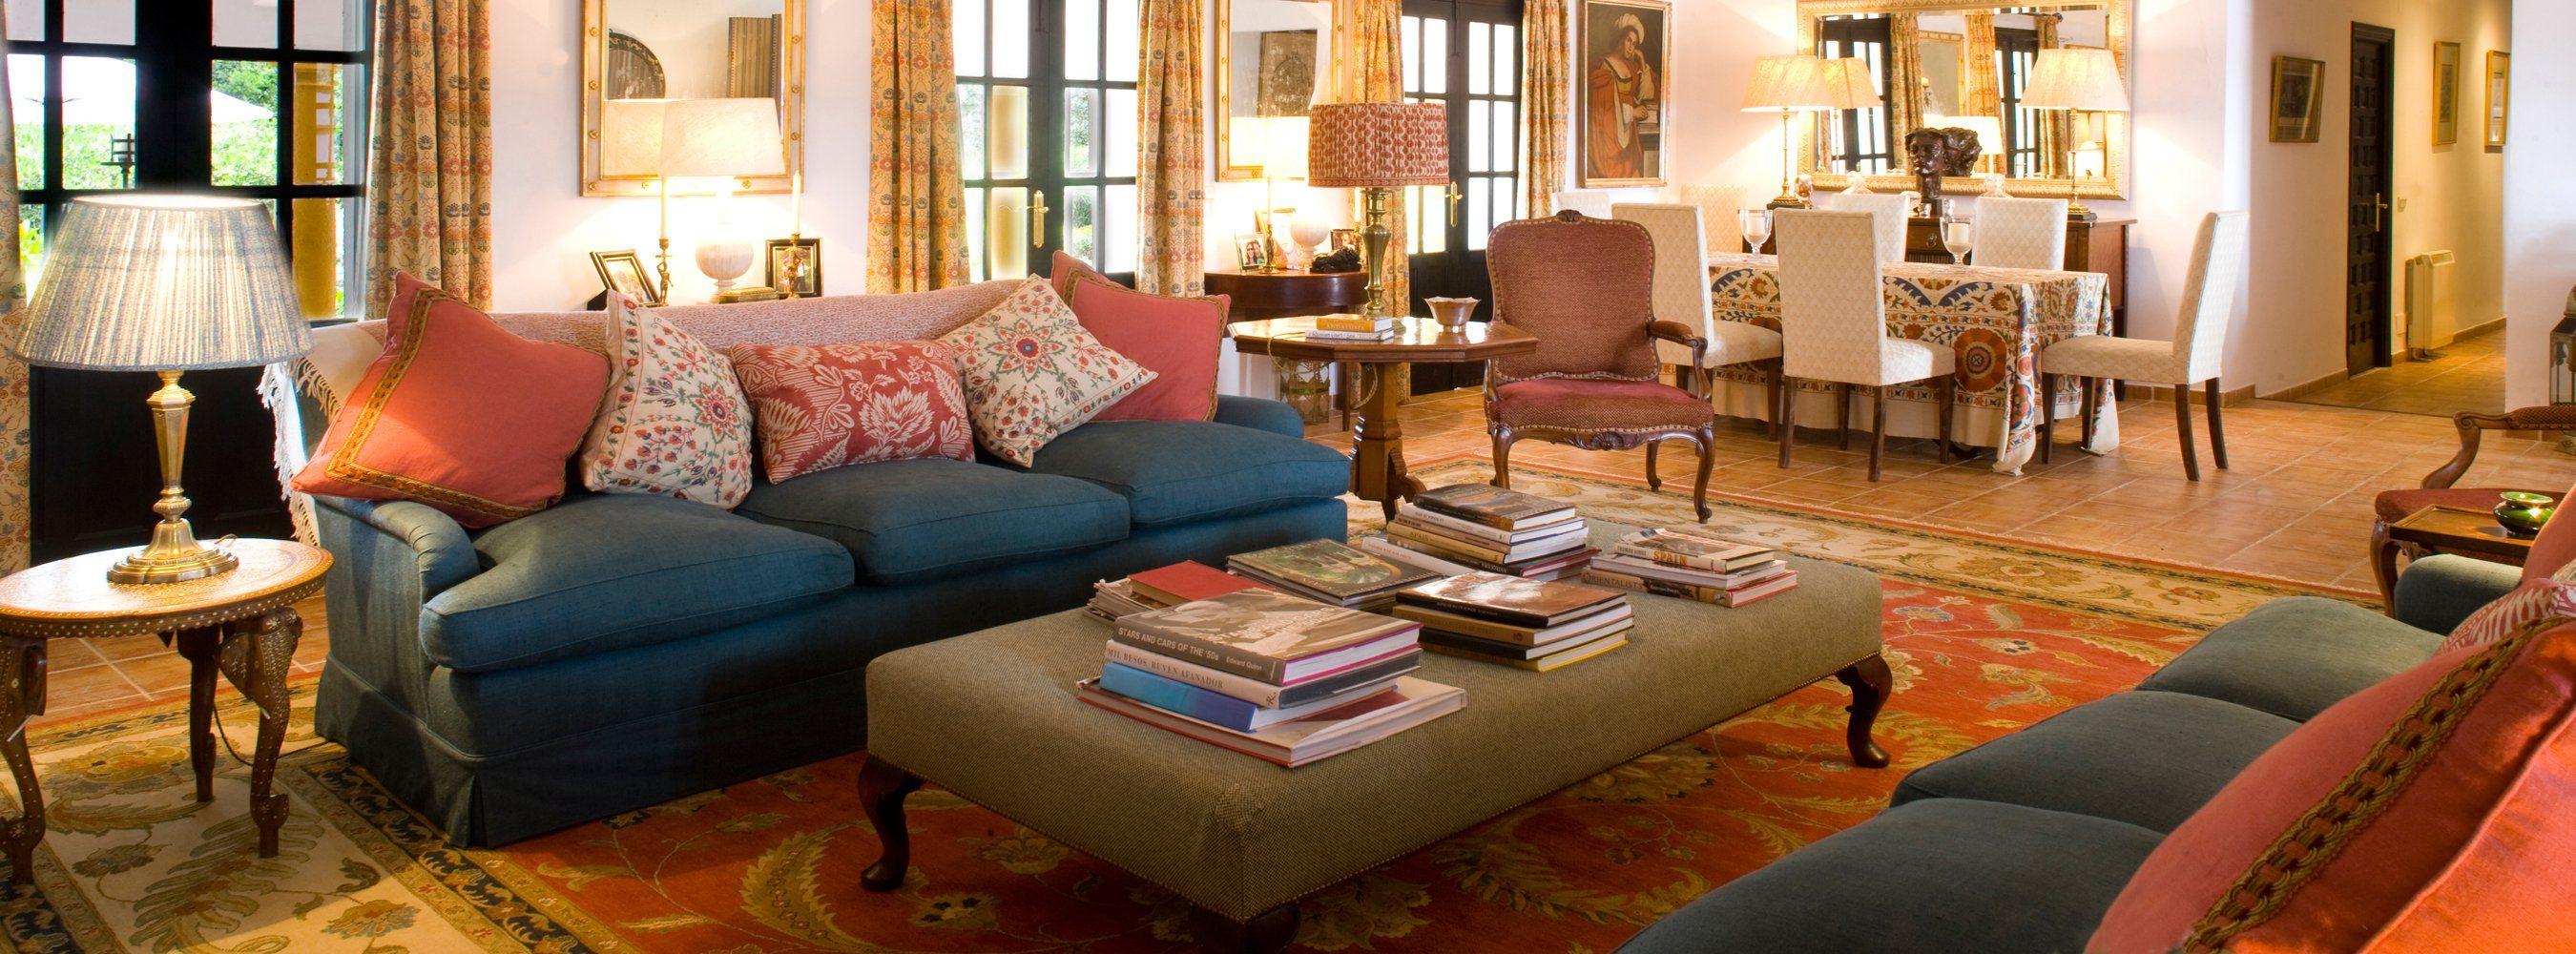 sitting room in luxury villa  ronda